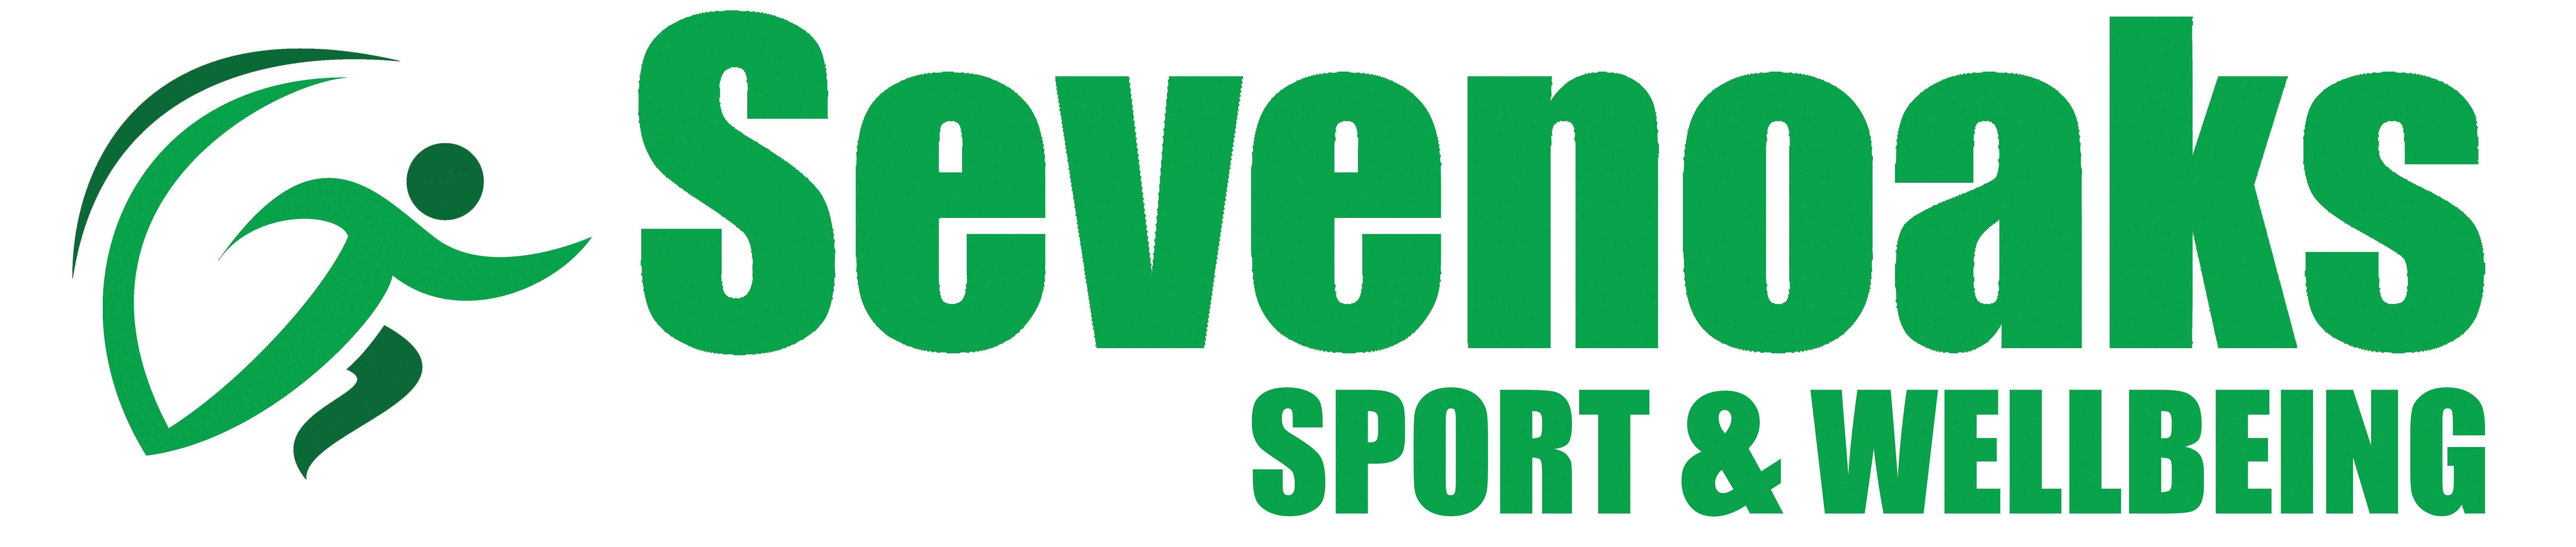 Sevenoaks Sport & Wellbeing